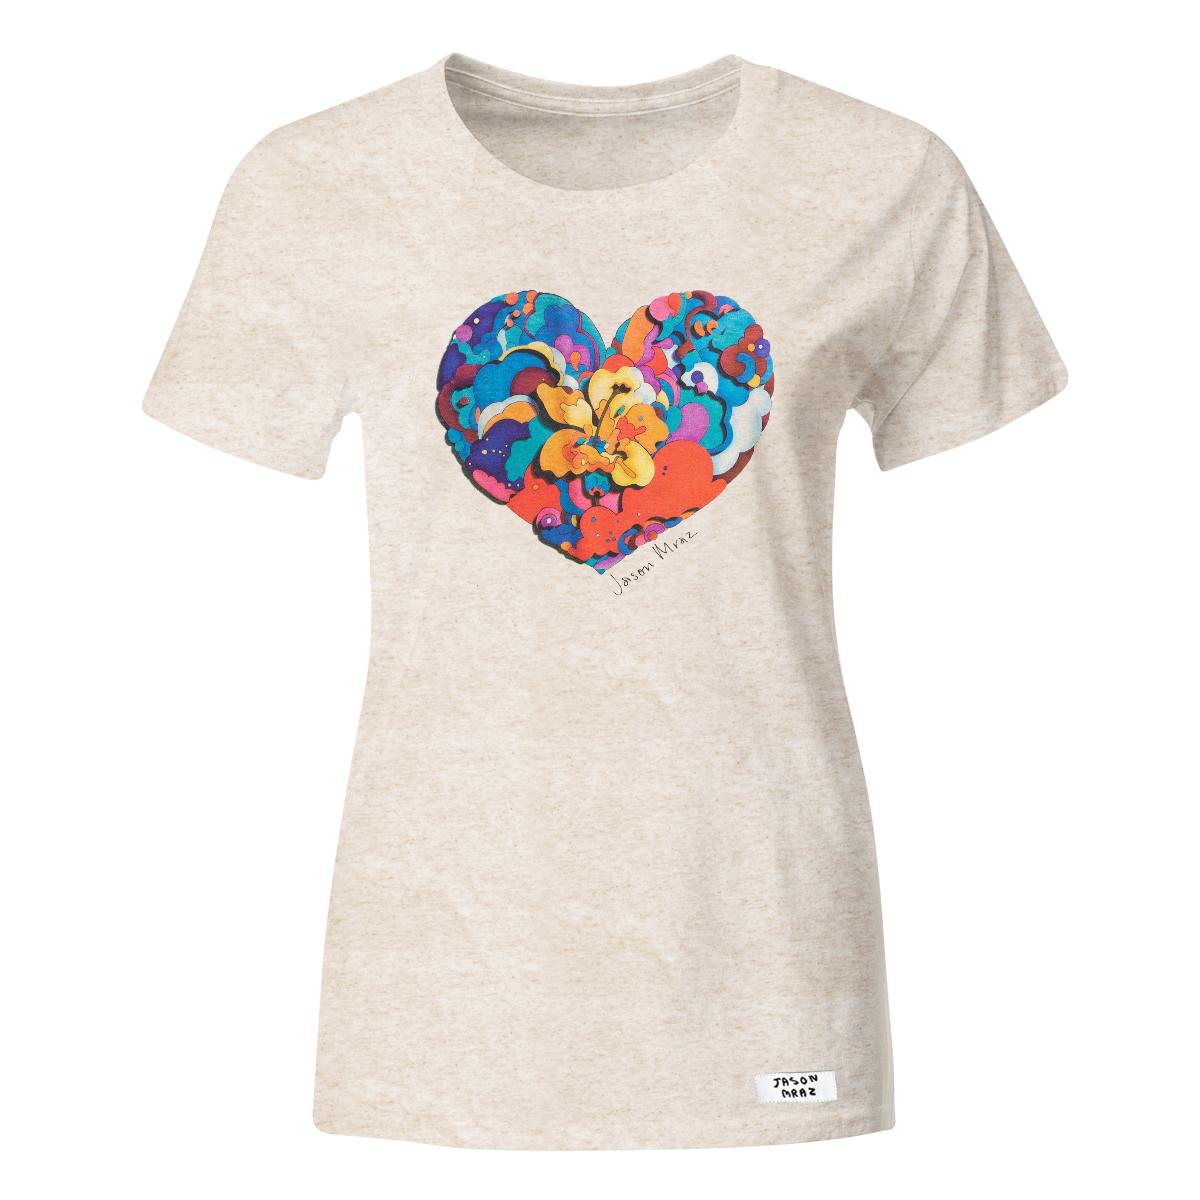 Jason Mraz Ladies Know. Tour T-shirt